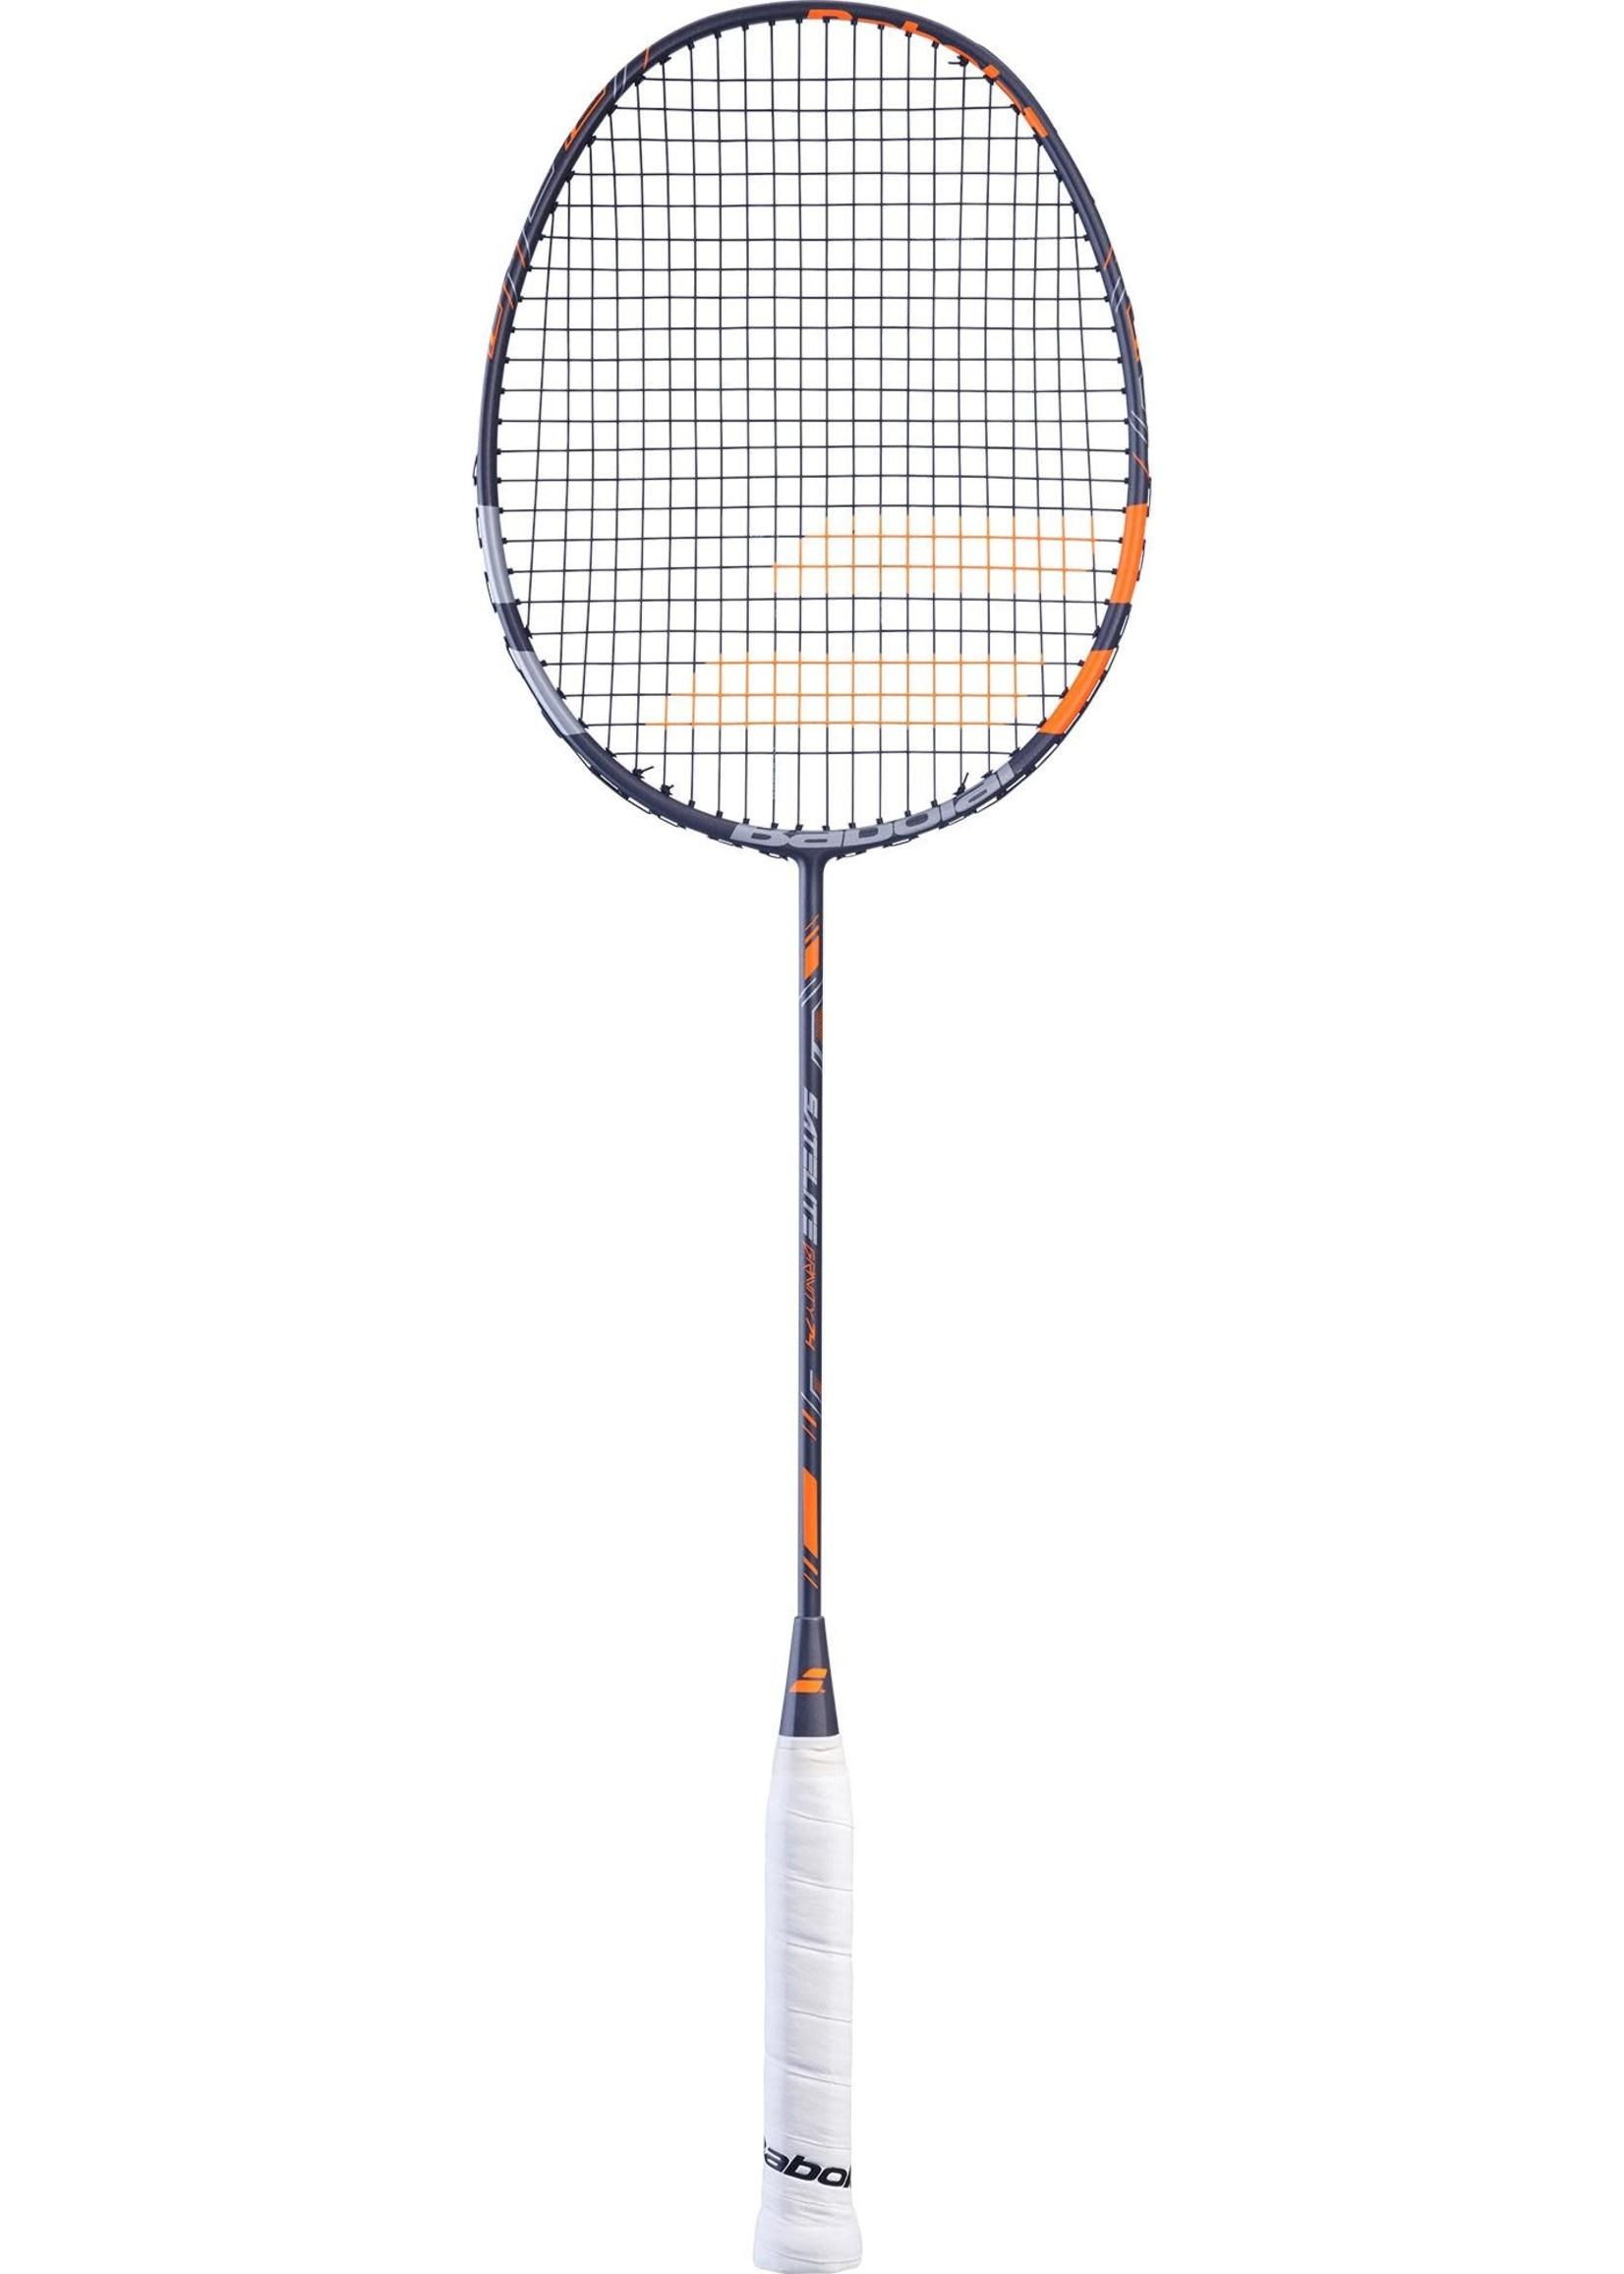 Babolat Babolat  Satelite Gravity  74 Badminton Racket (2019)